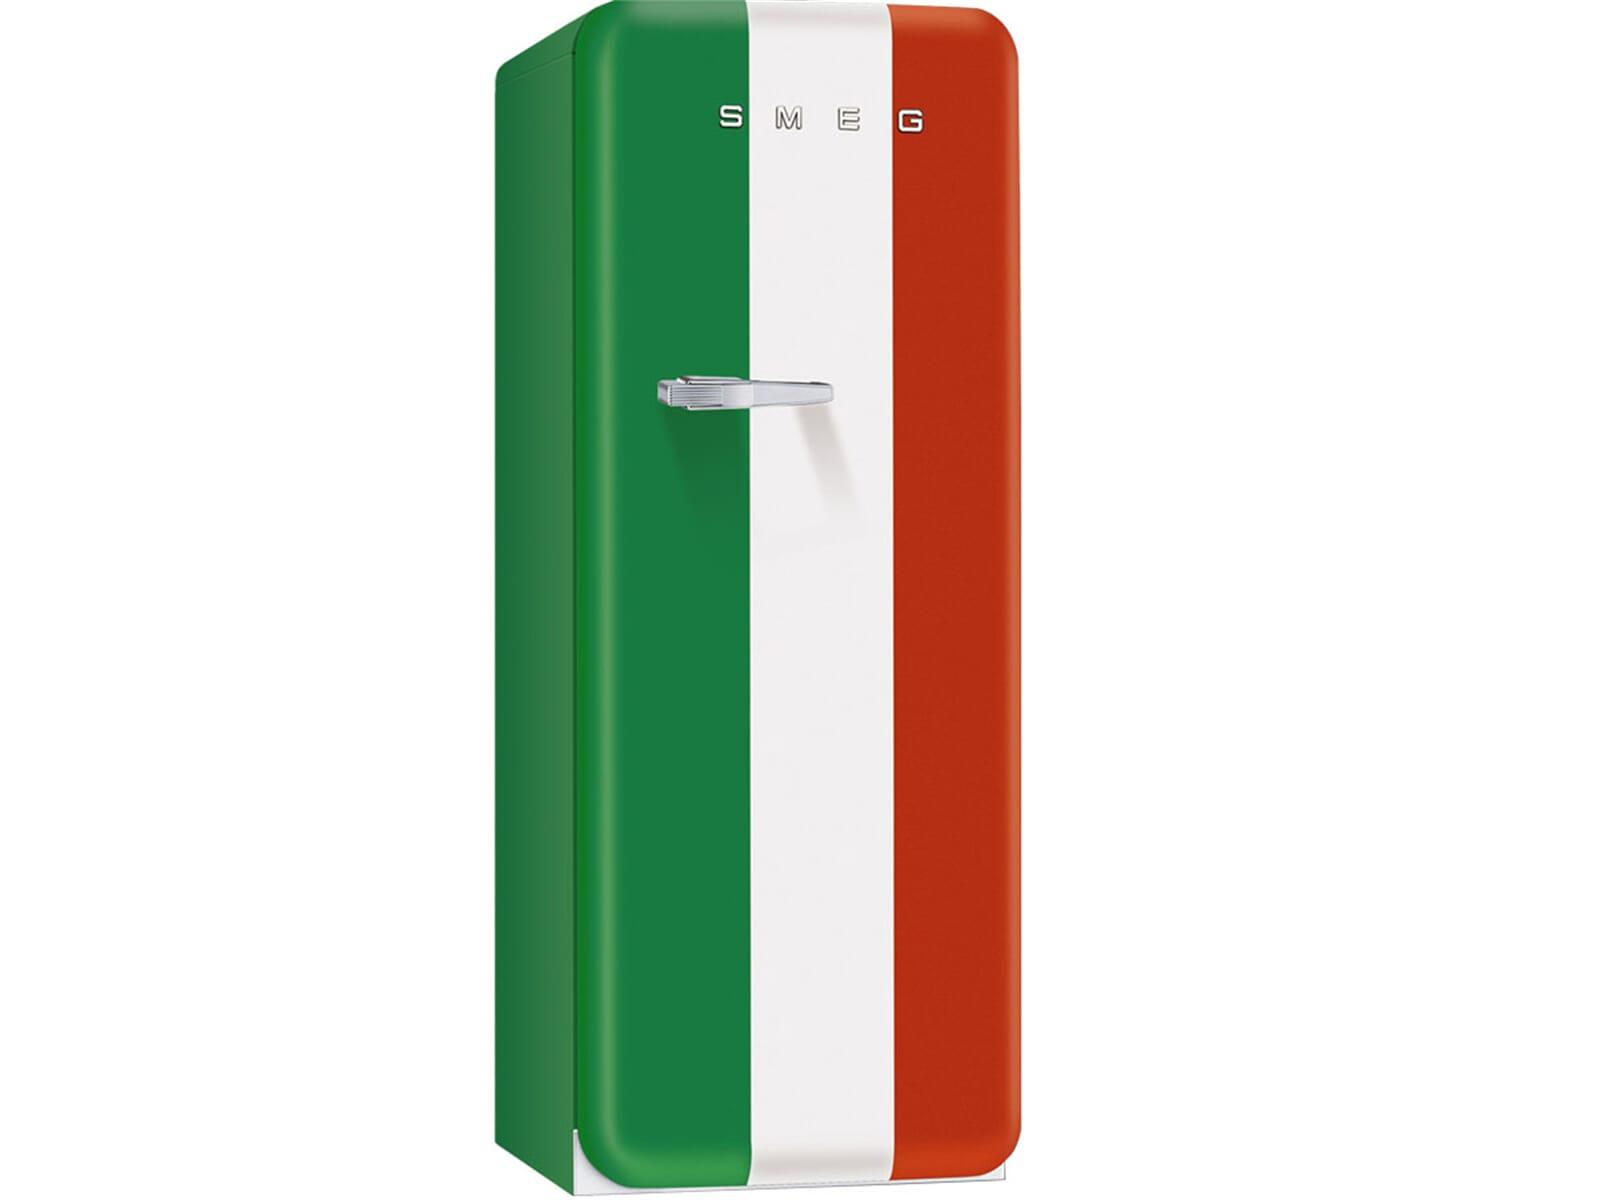 Smeg fab28rit1 standkuhlschrank italia for Standkühlschrank